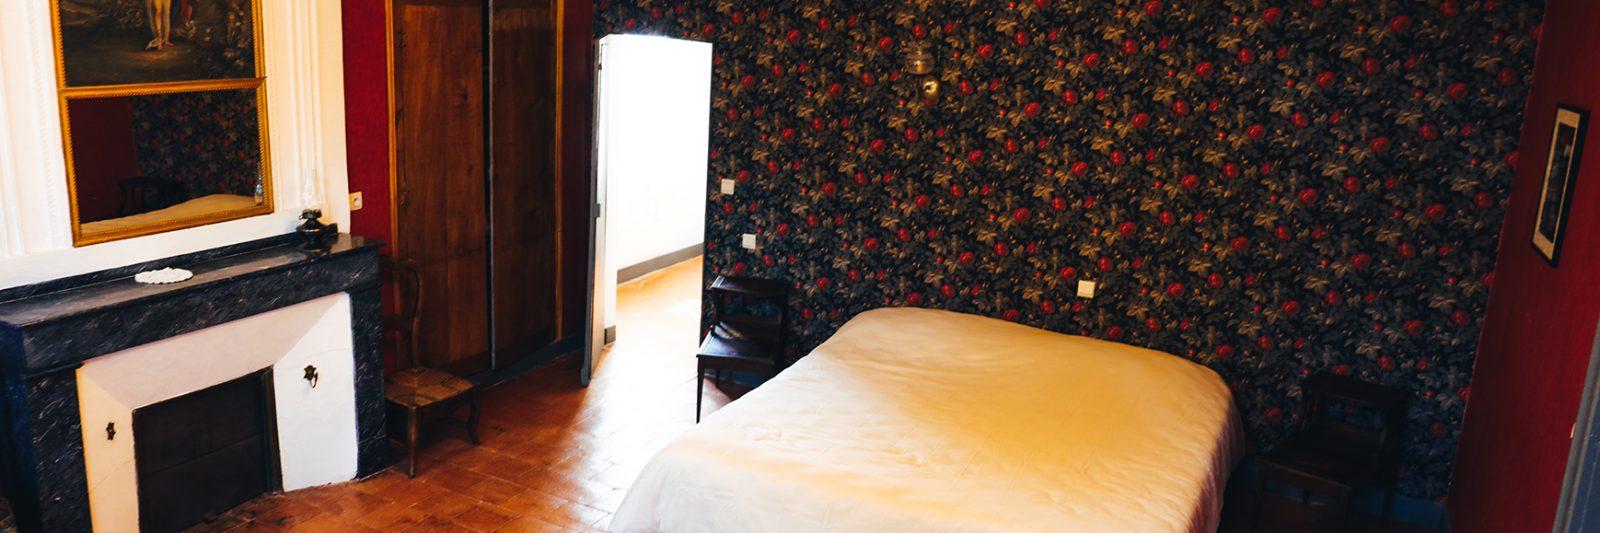 chambre des roses